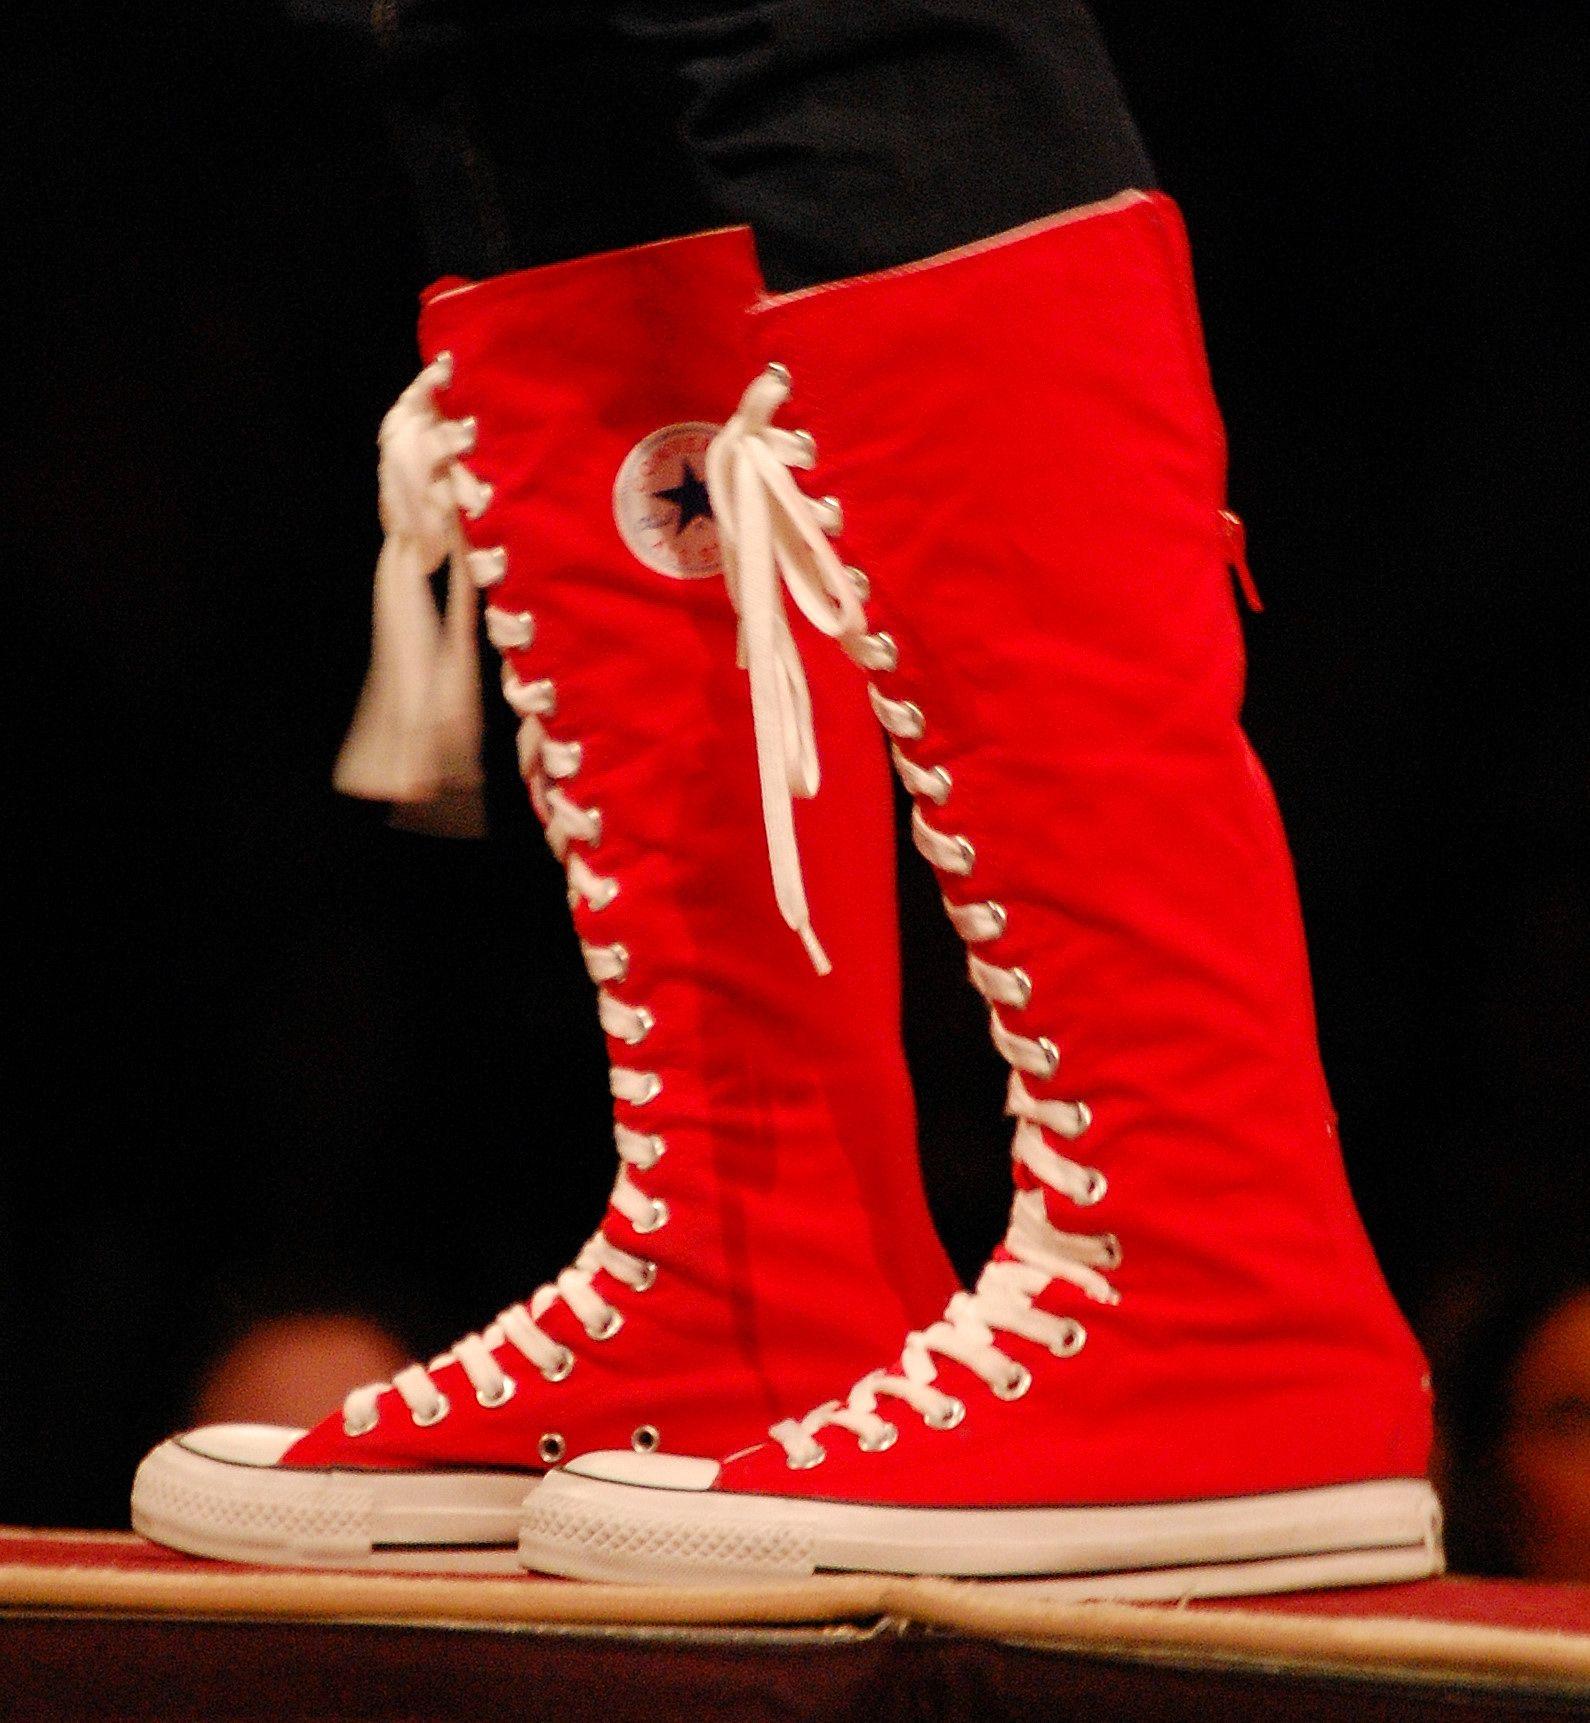 converse boots - Google Search  b2d5fff62